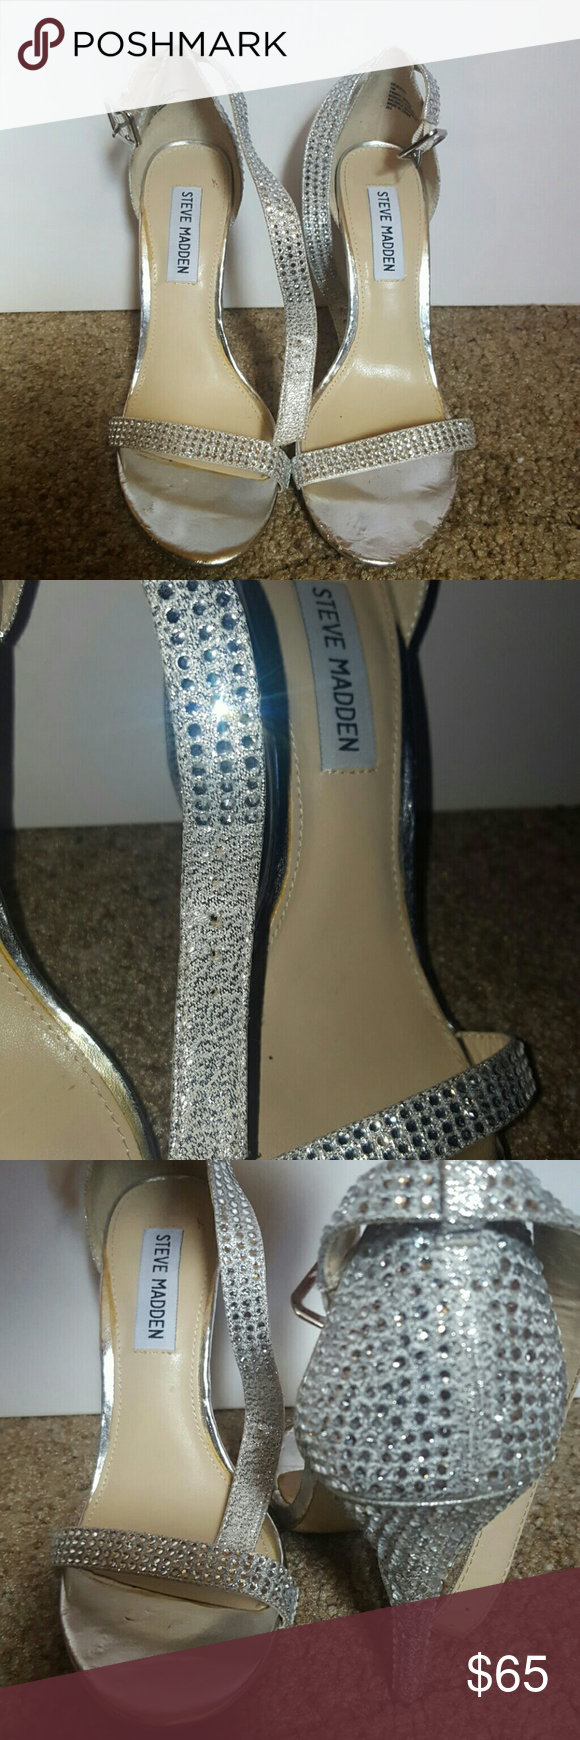 Women's Steve Madden Heels High-heels. Silver. Sparkling. Rhinestone. Slim ankle strap. Chic. Steve Madden Shoes Heels